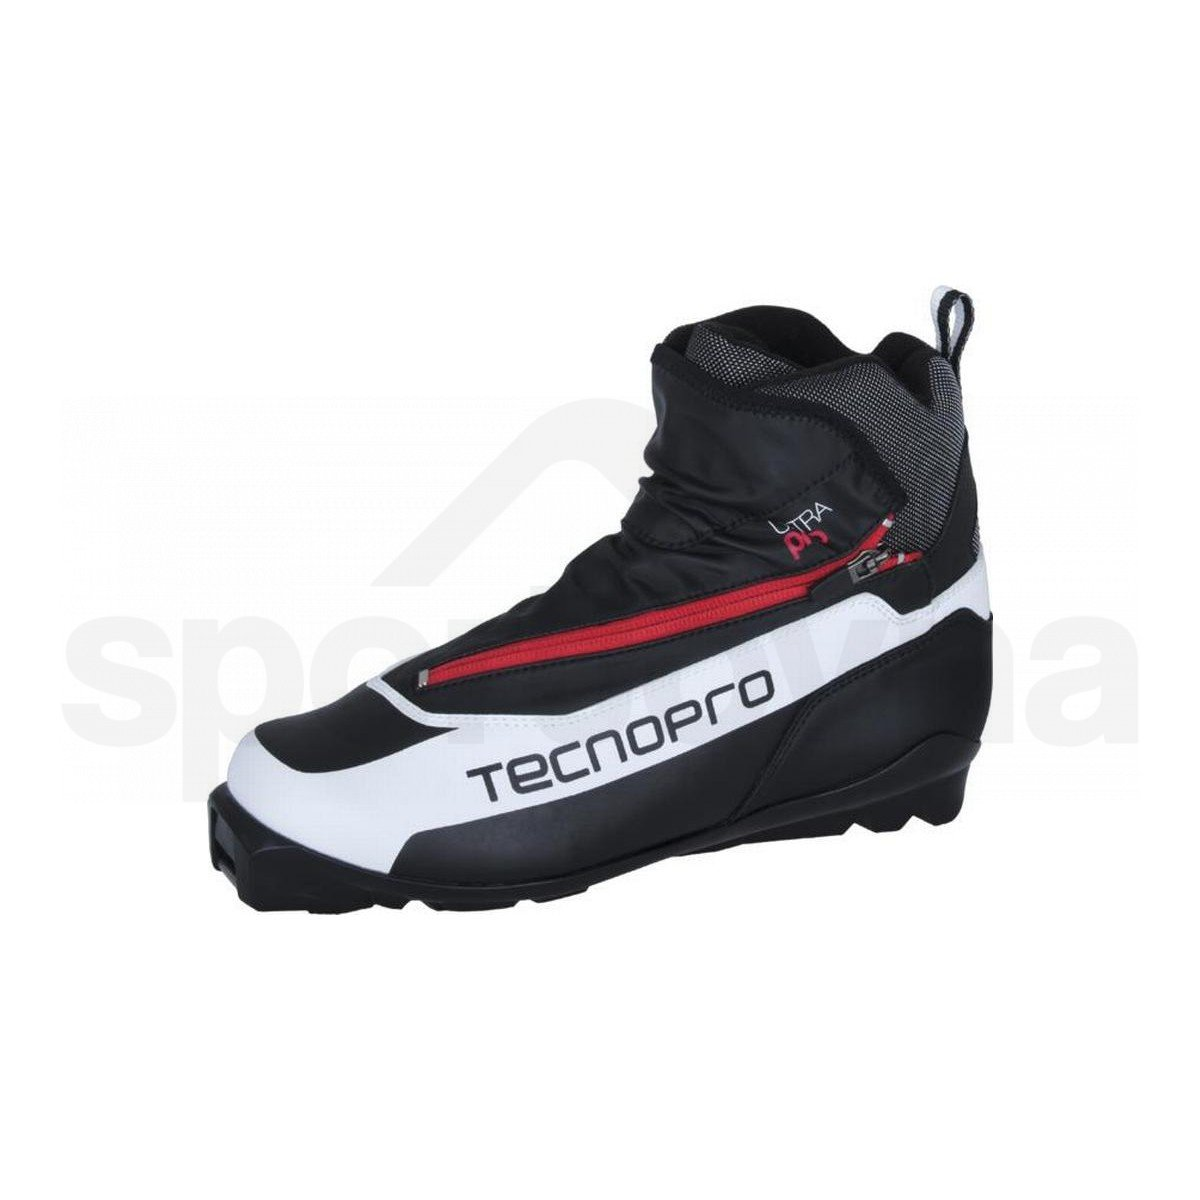 tecnopro-ultra-pro